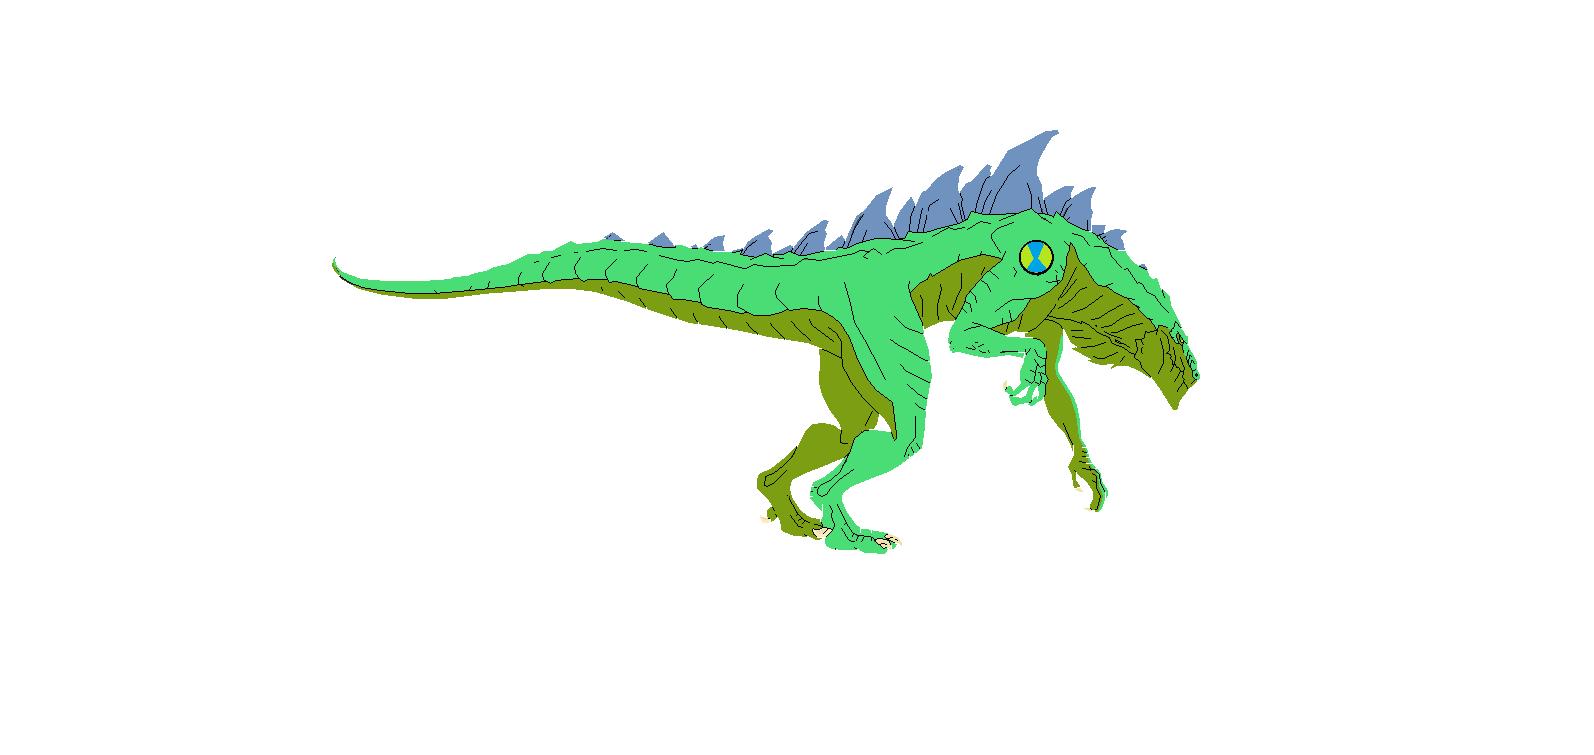 Iguanasaurus